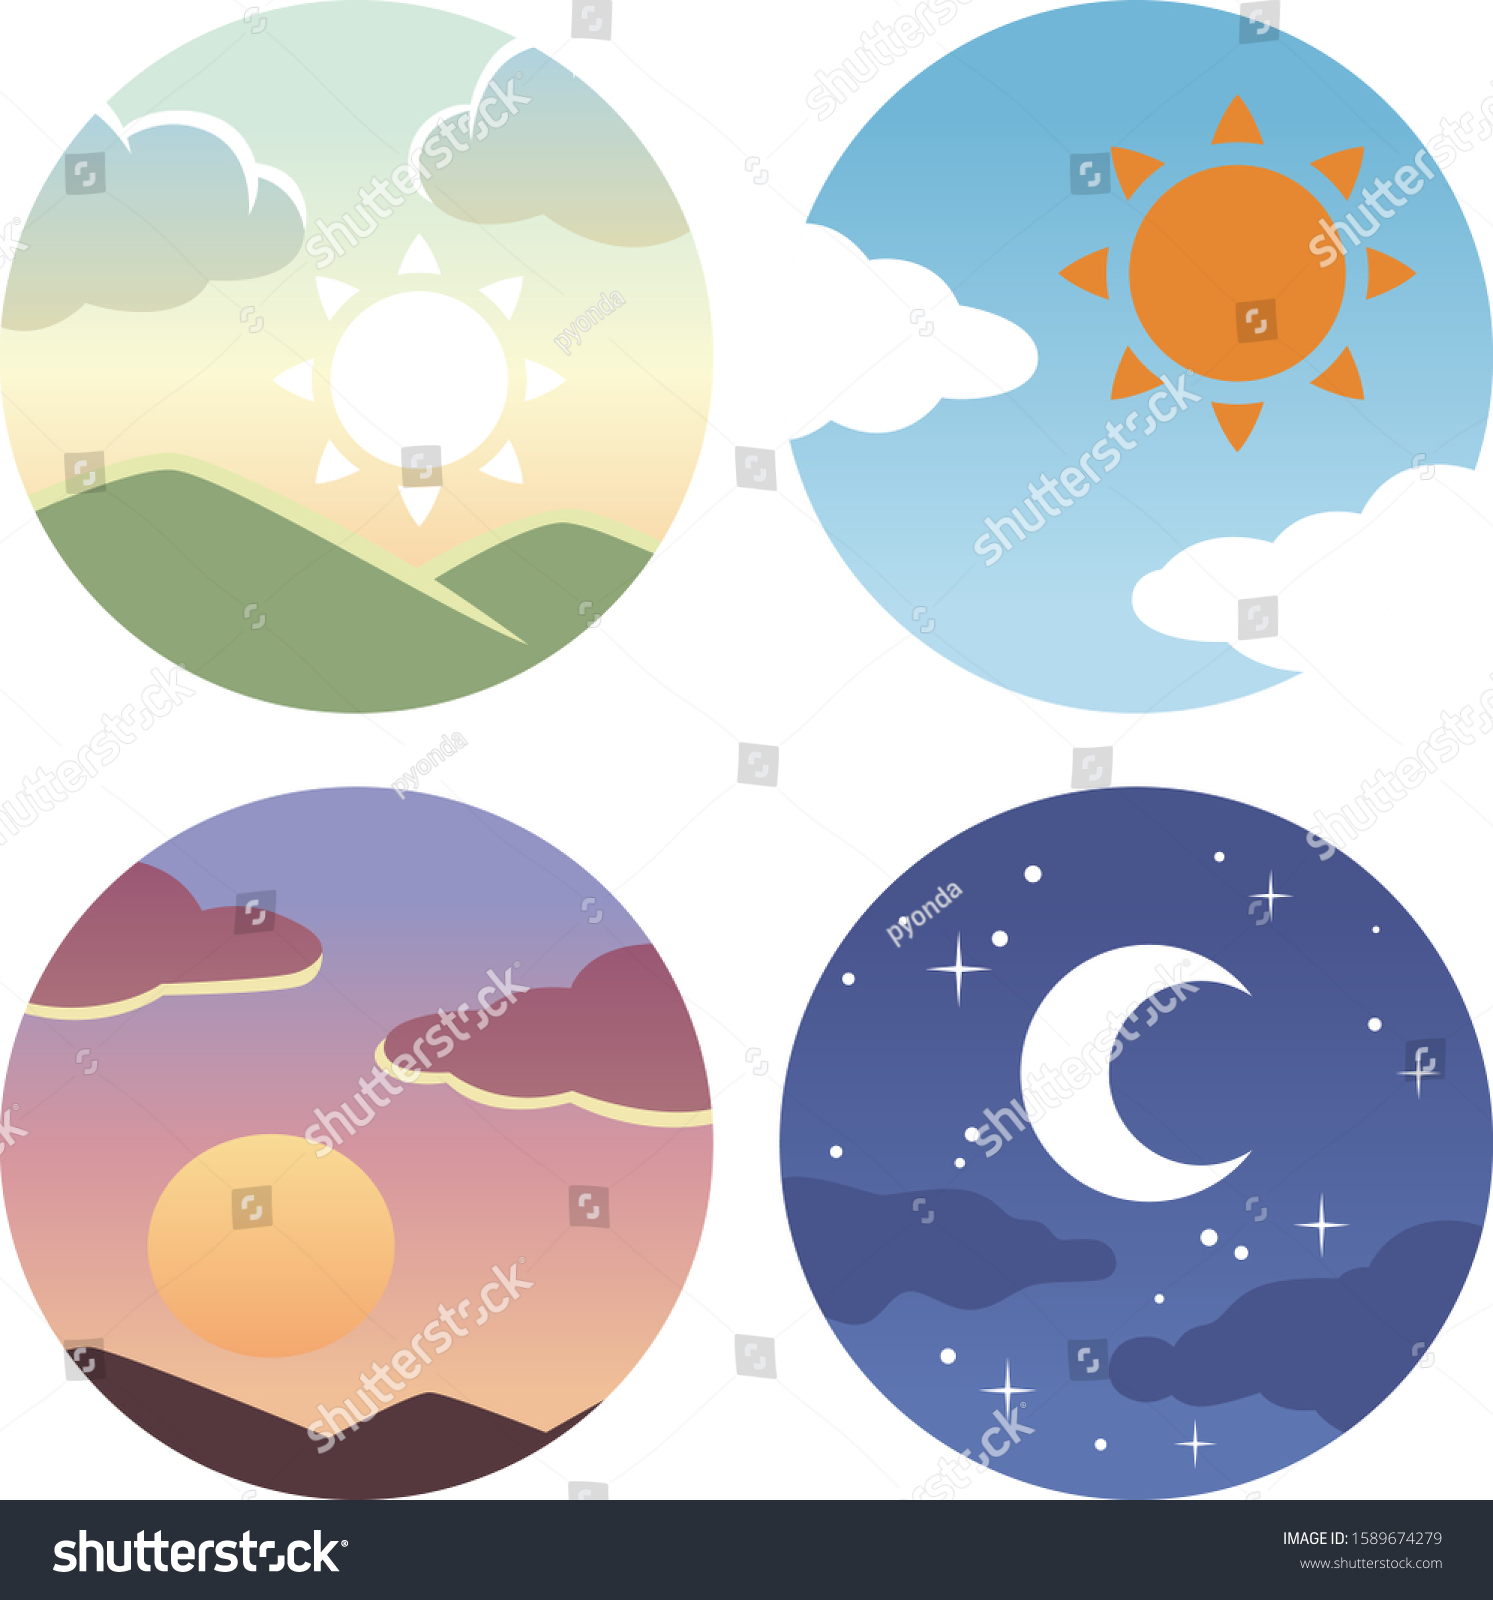 Morning, noon, evening circle icon